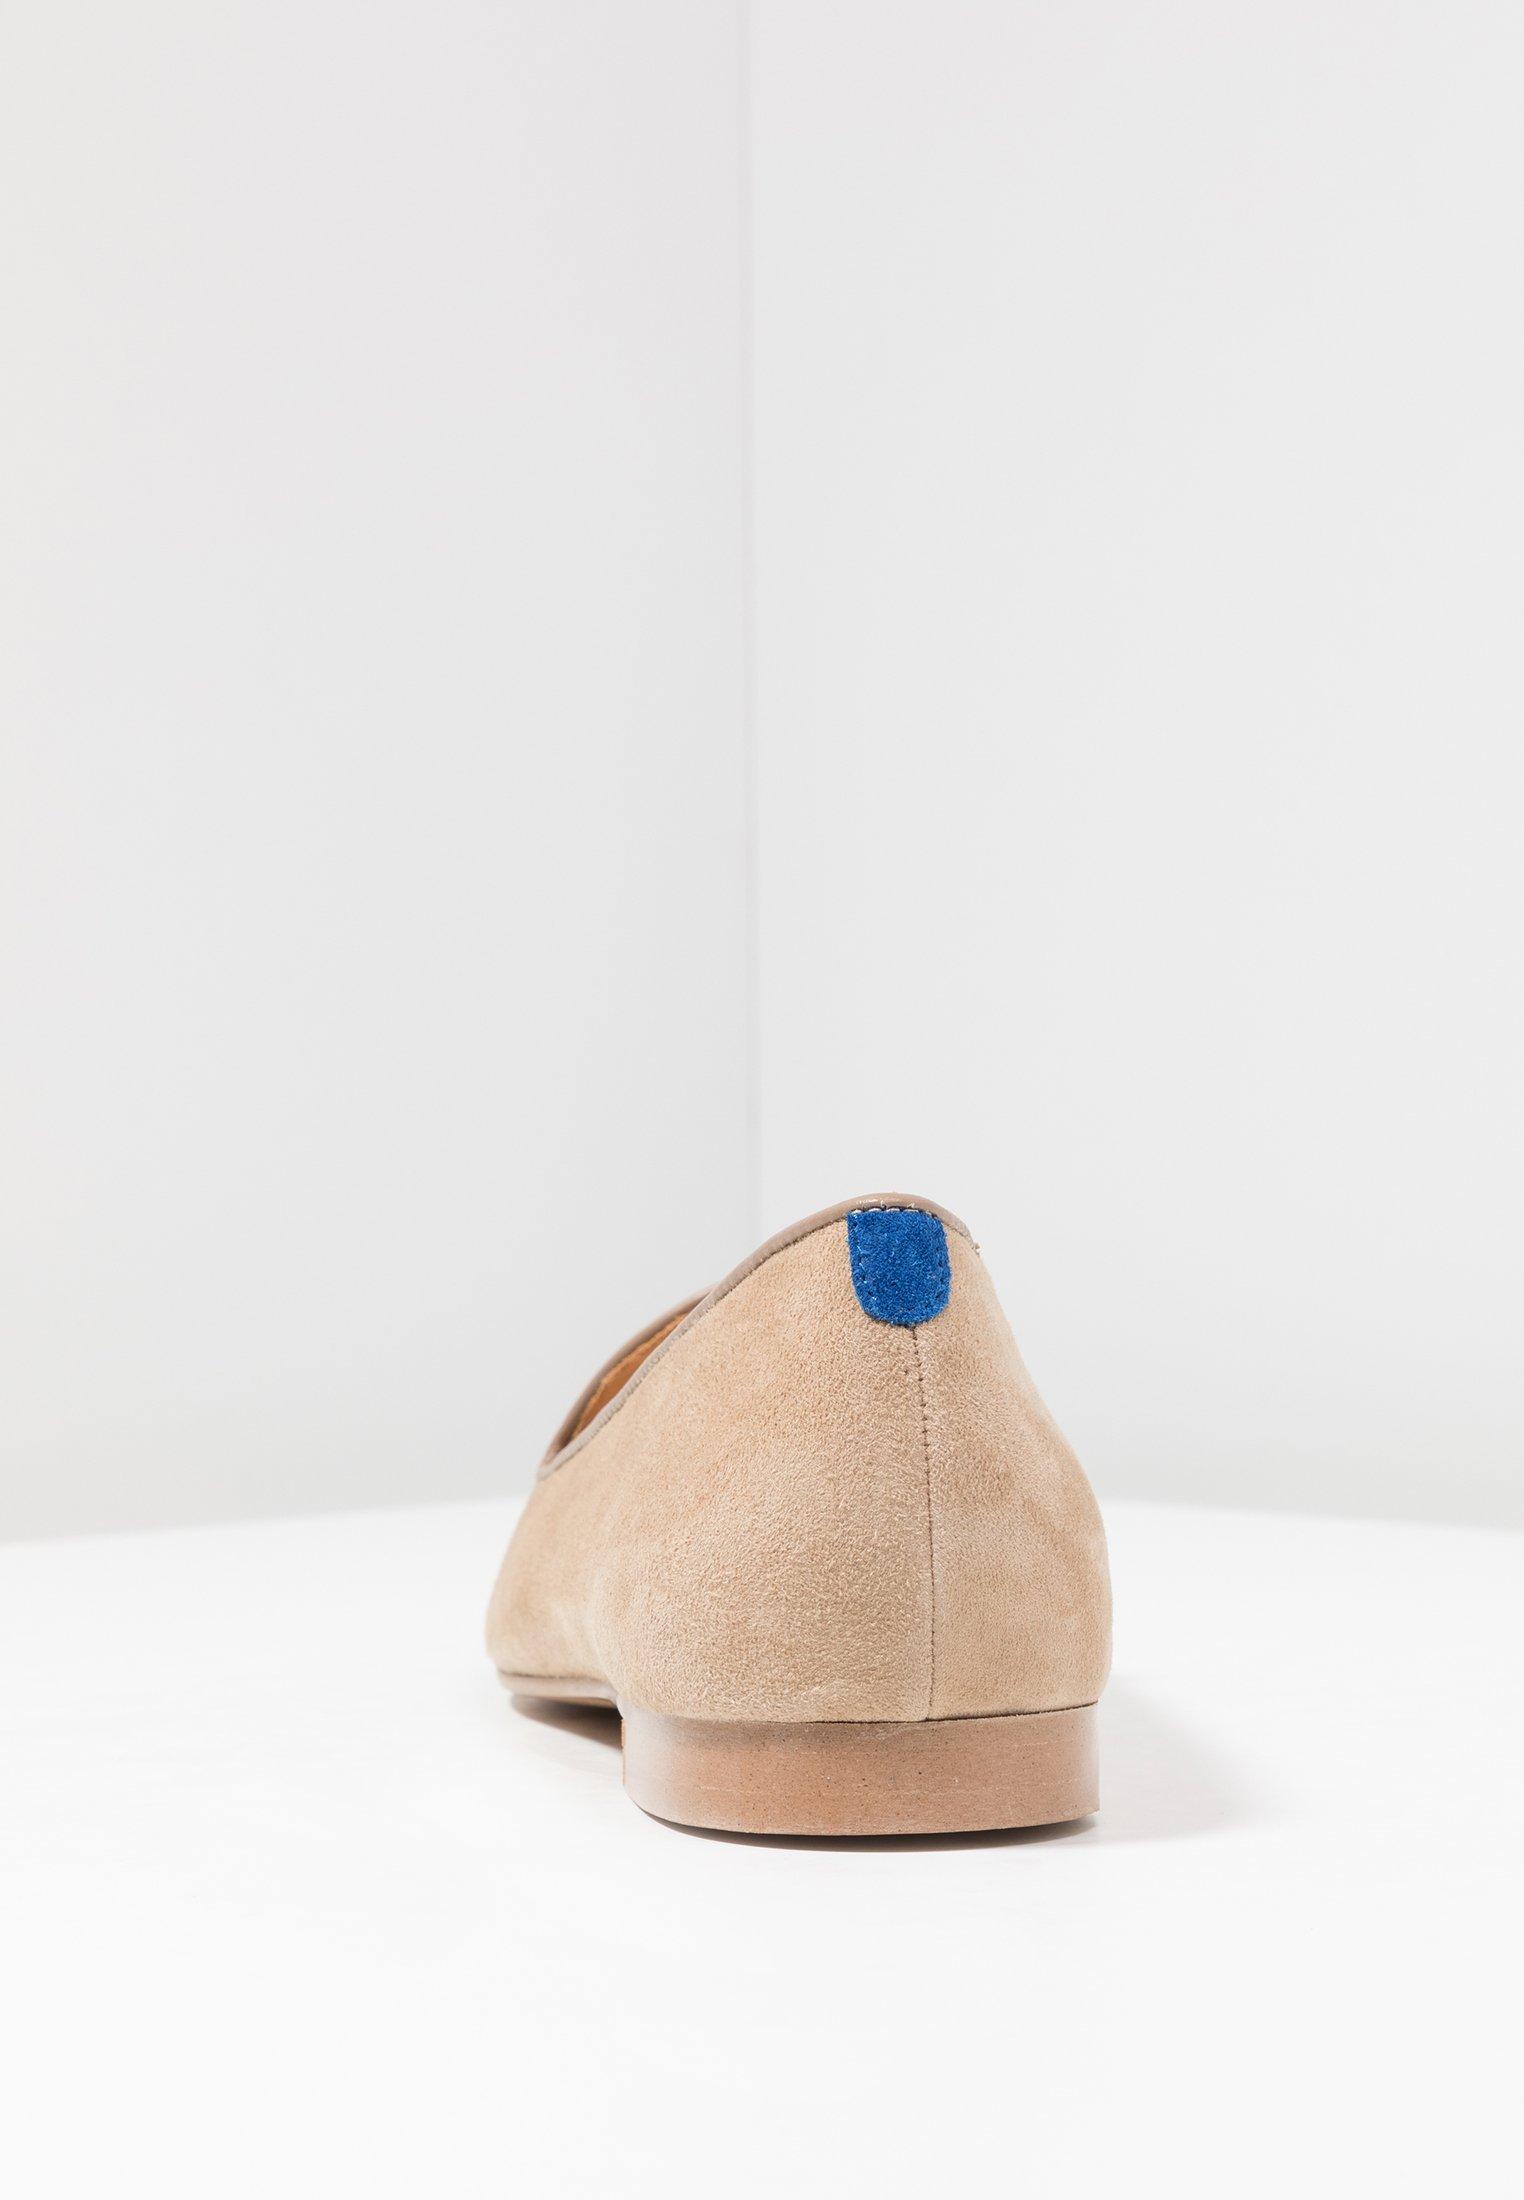 Chatelles François - Loafers Beige